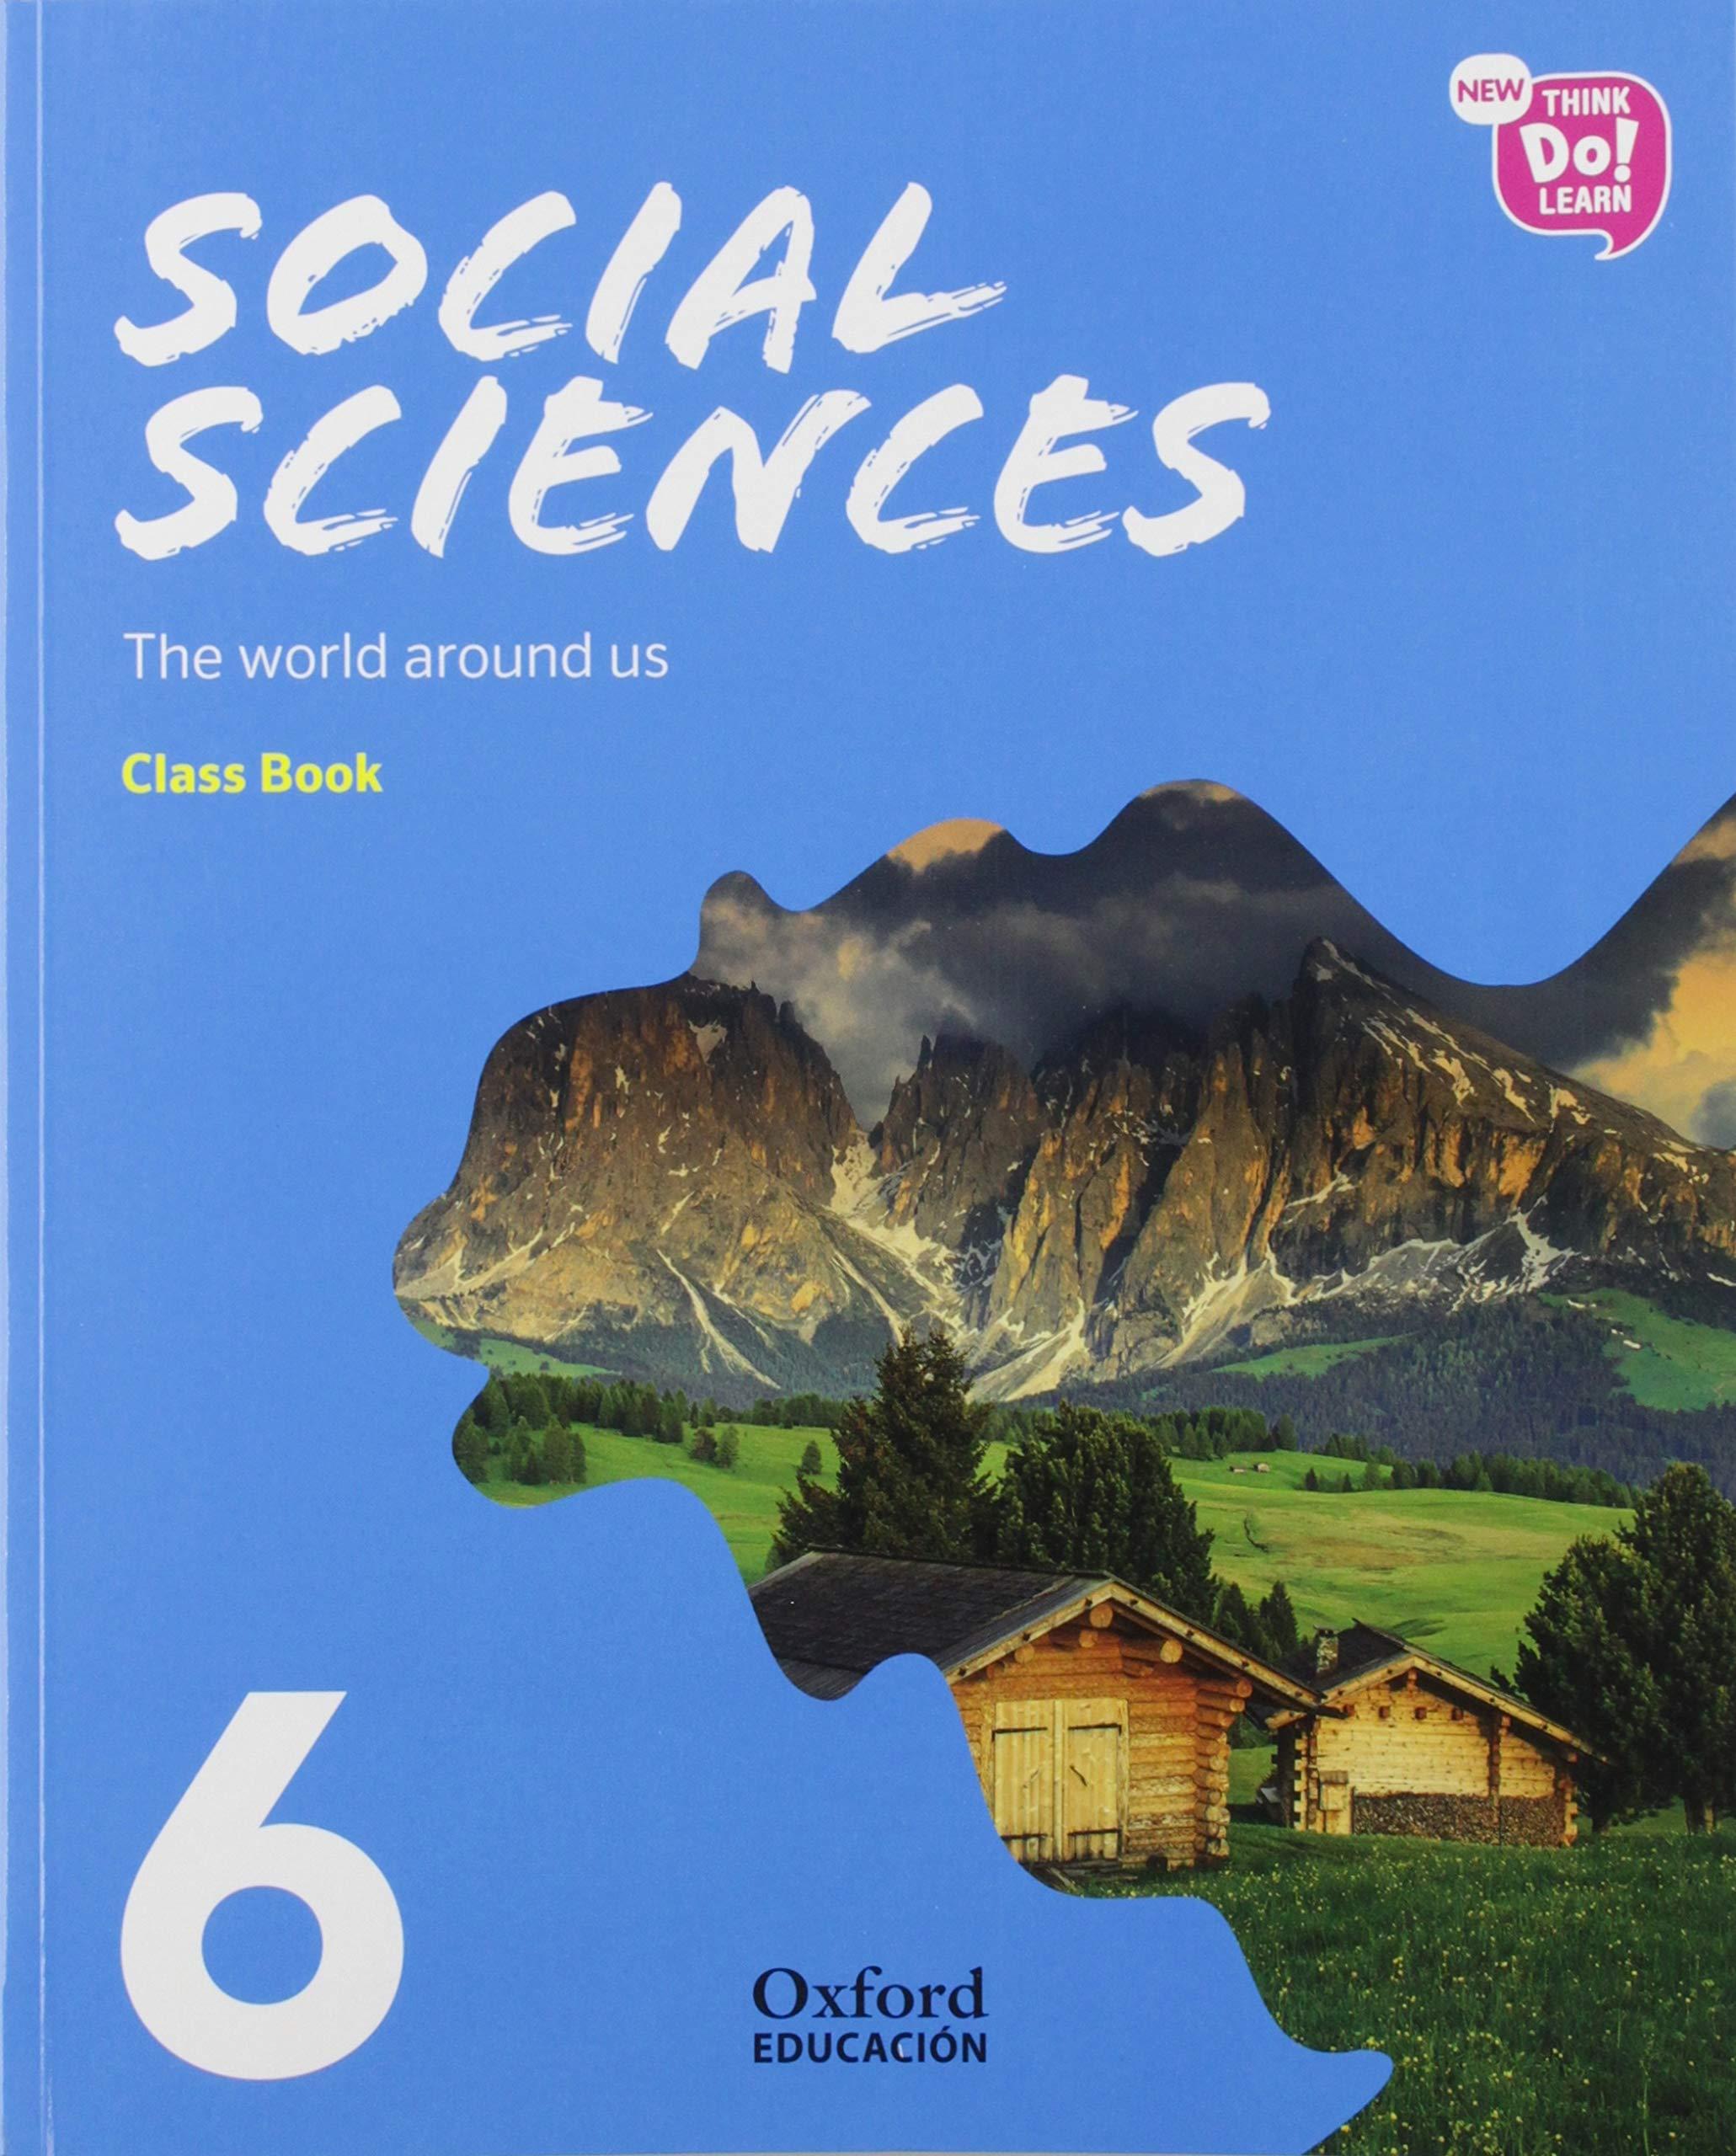 New Think Do Learn Social Sciences 6. Class Book Pack National Edition: Amazon.es: Libros en idiomas extranjeros